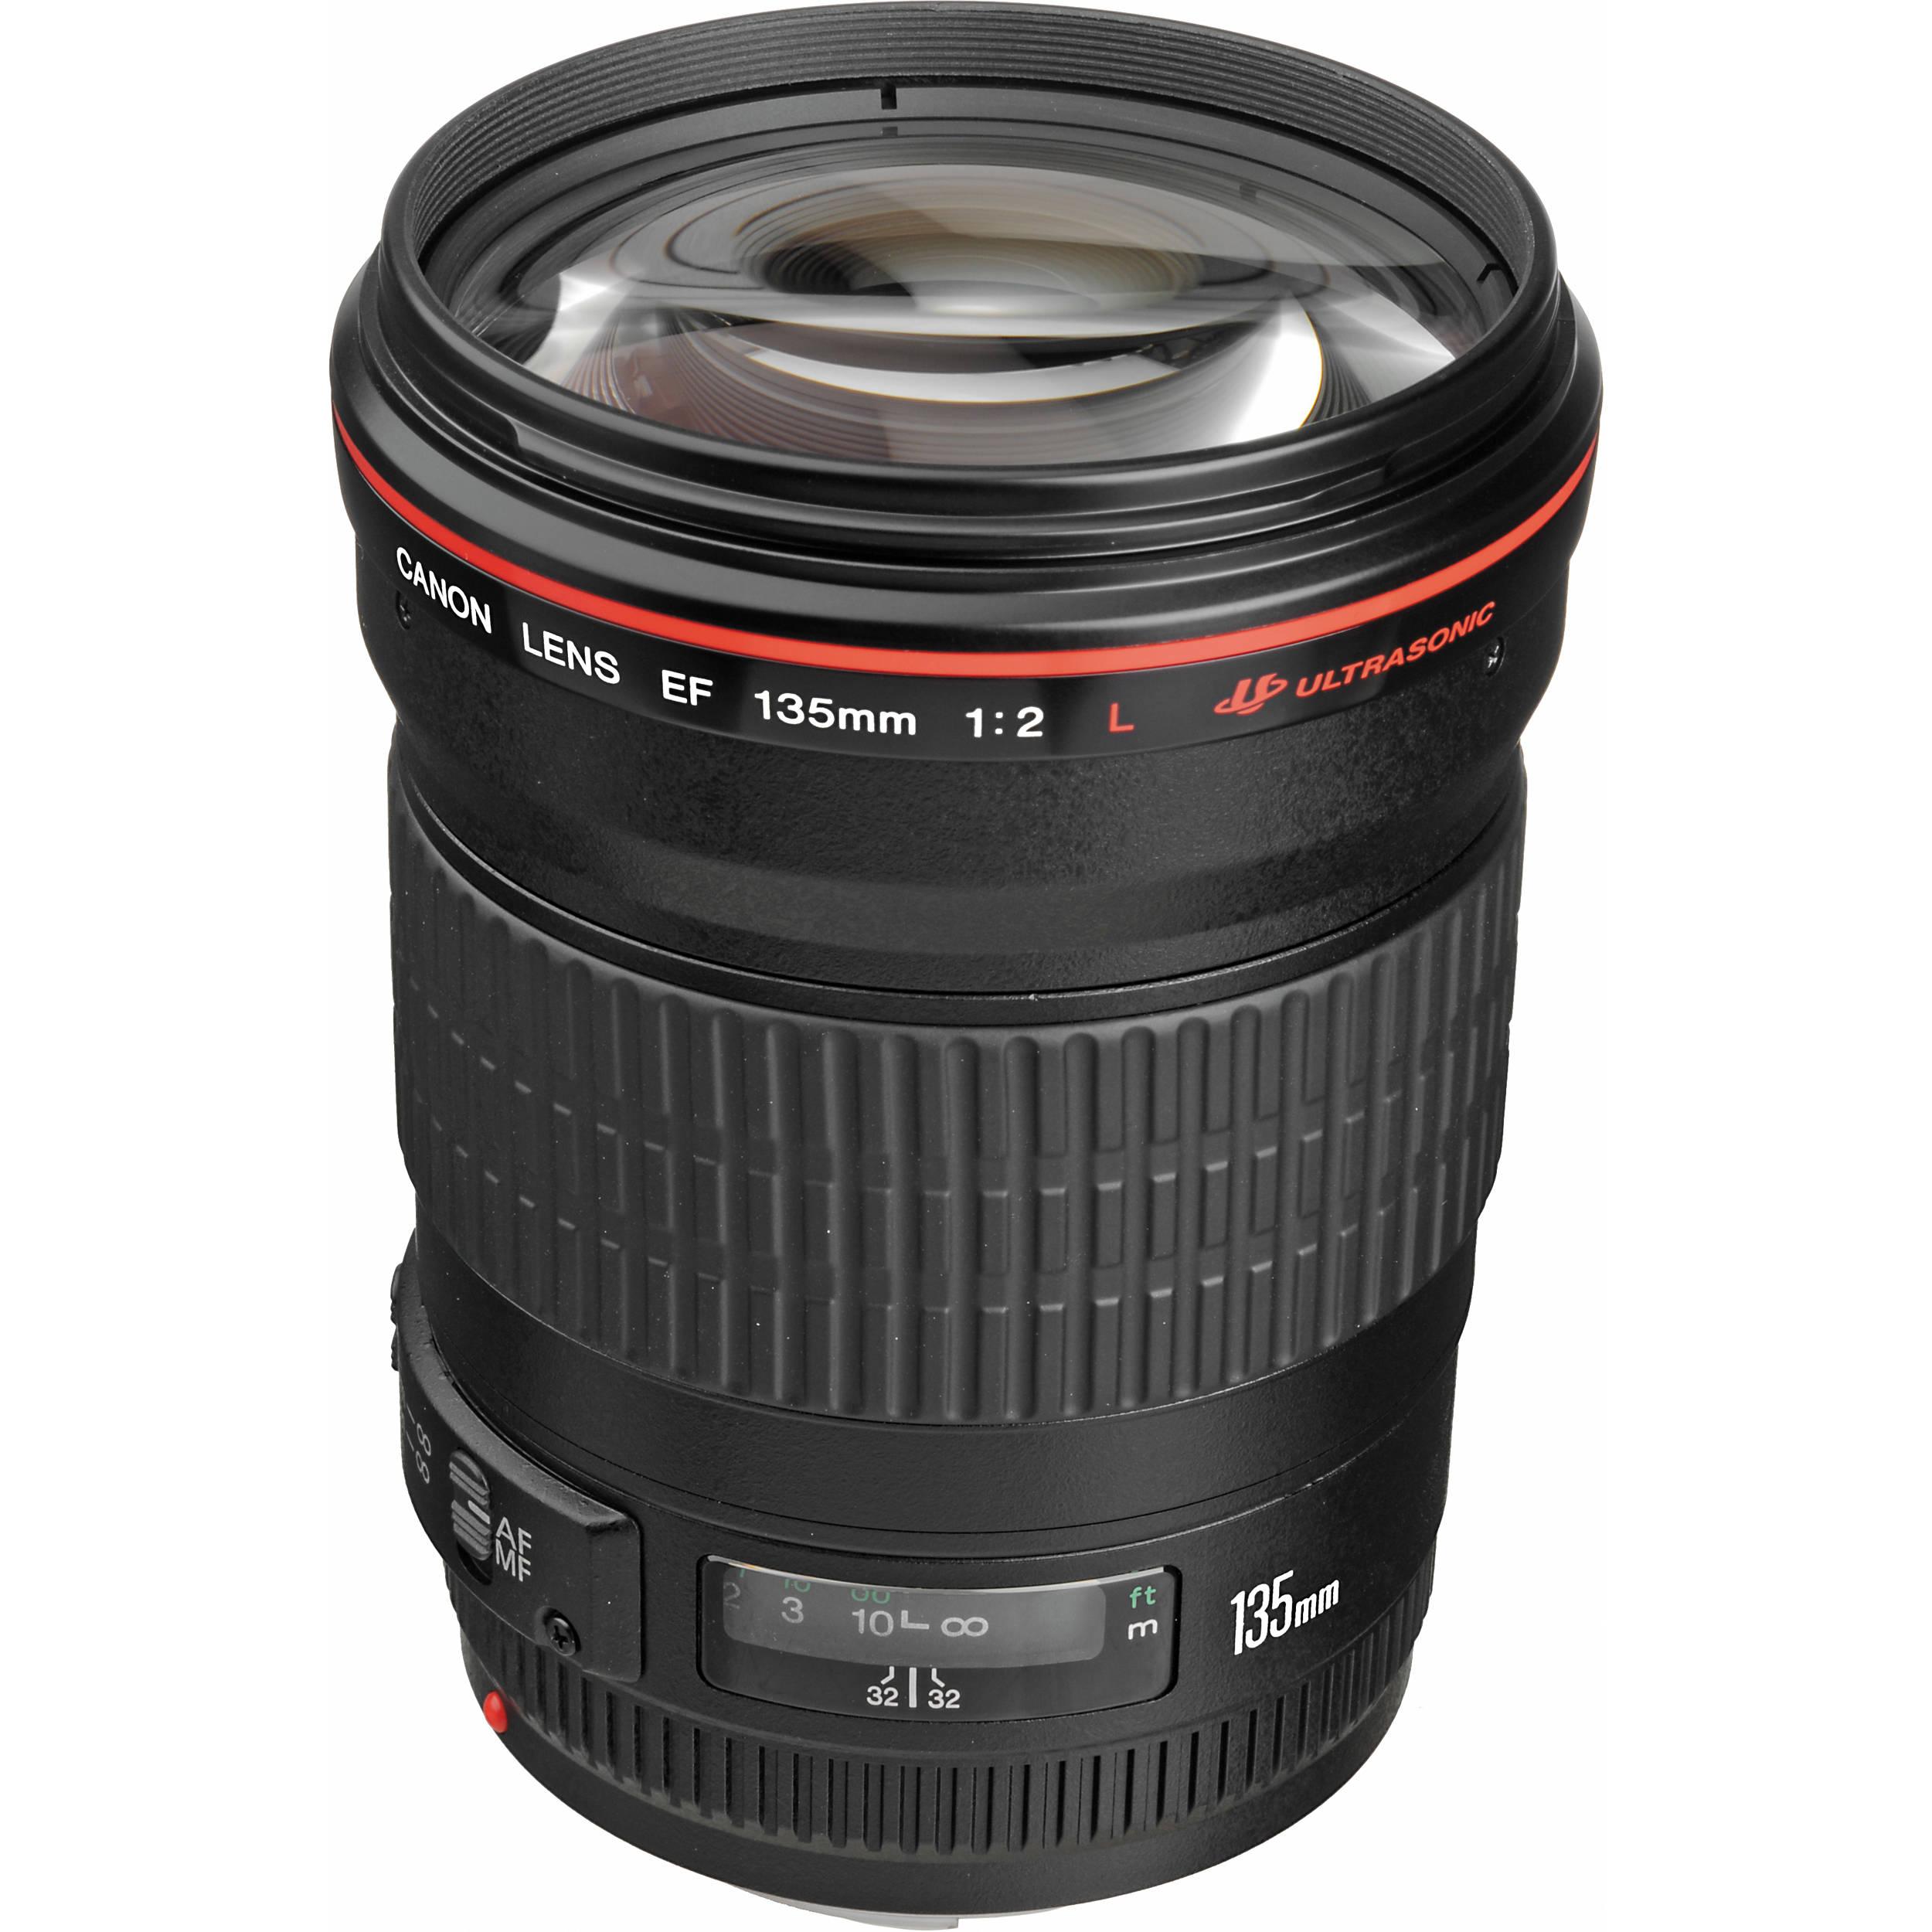 Canon_2520A004_Telephoto_EF_135mm_f_2_0L_112539.jpg